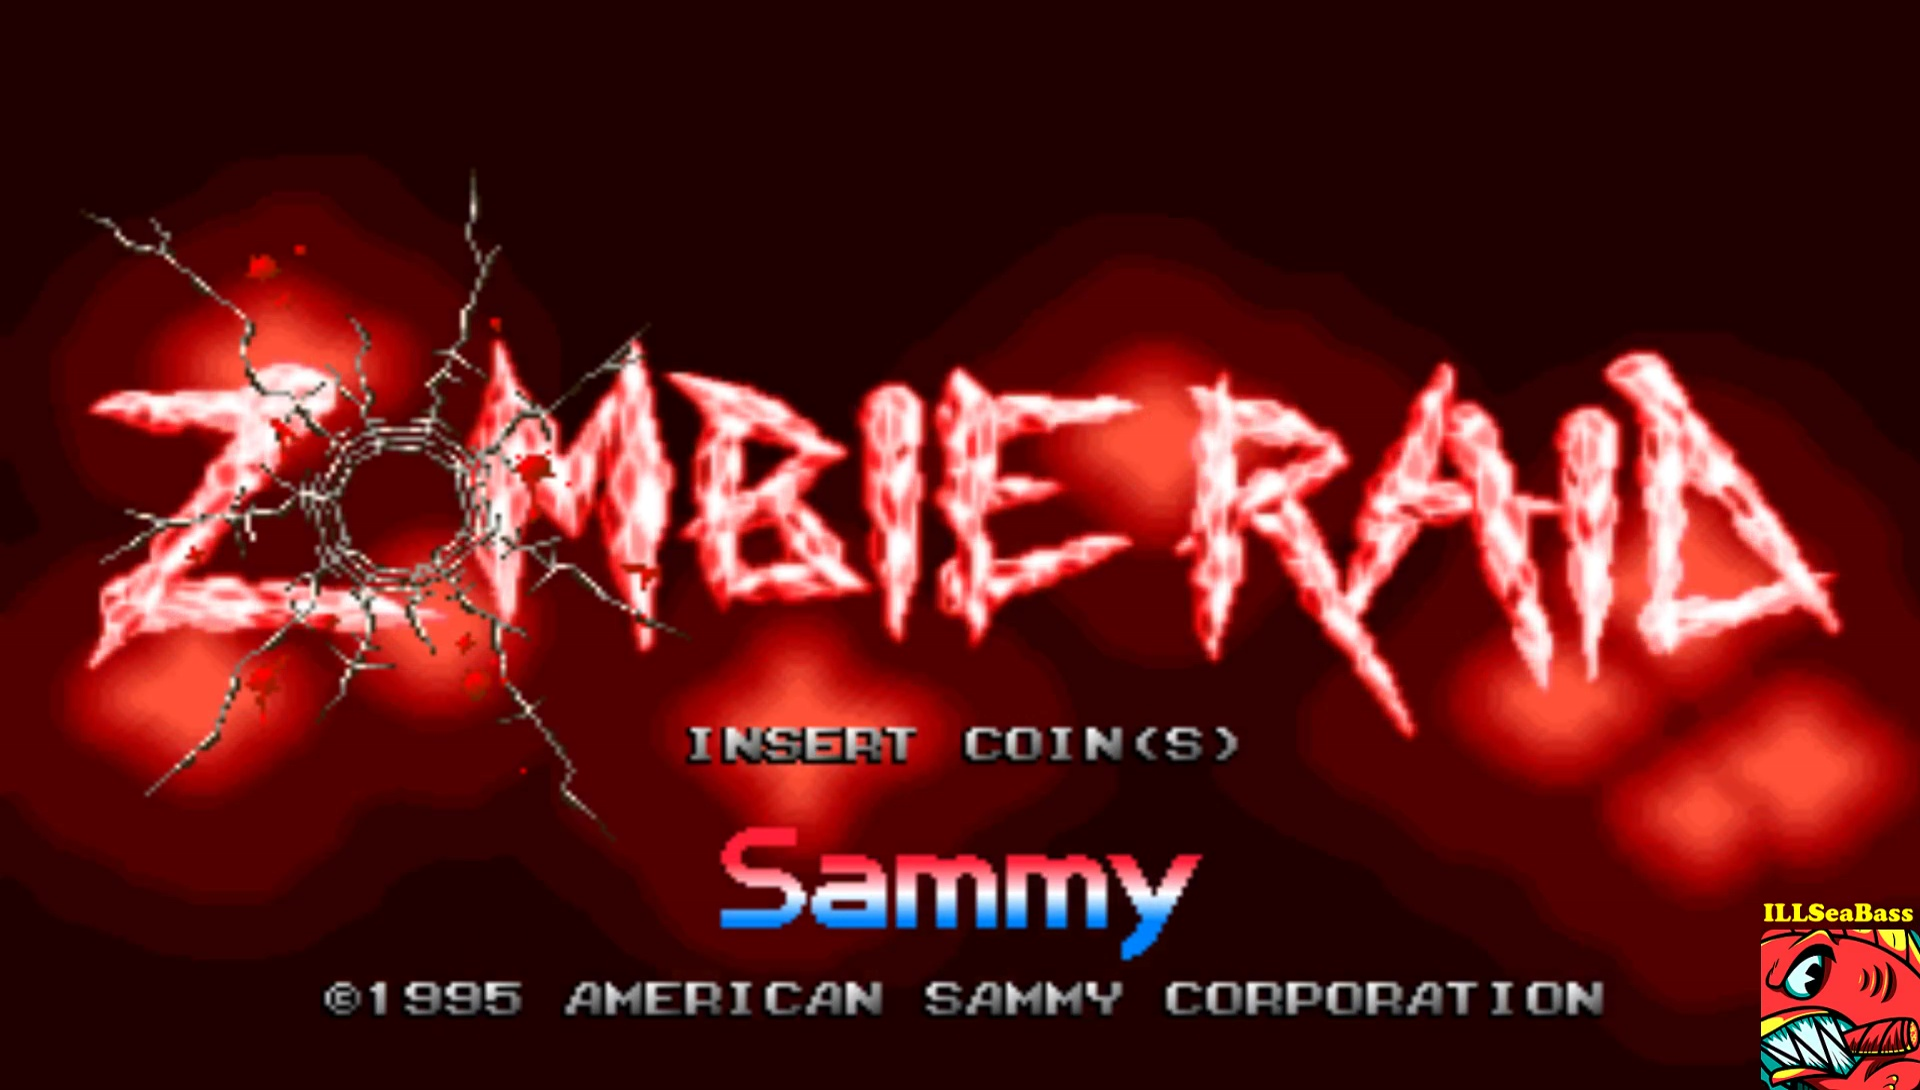 ILLSeaBass: Zombie Raid (Arcade Emulated / M.A.M.E.) 15,860 points on 2017-02-20 20:38:37